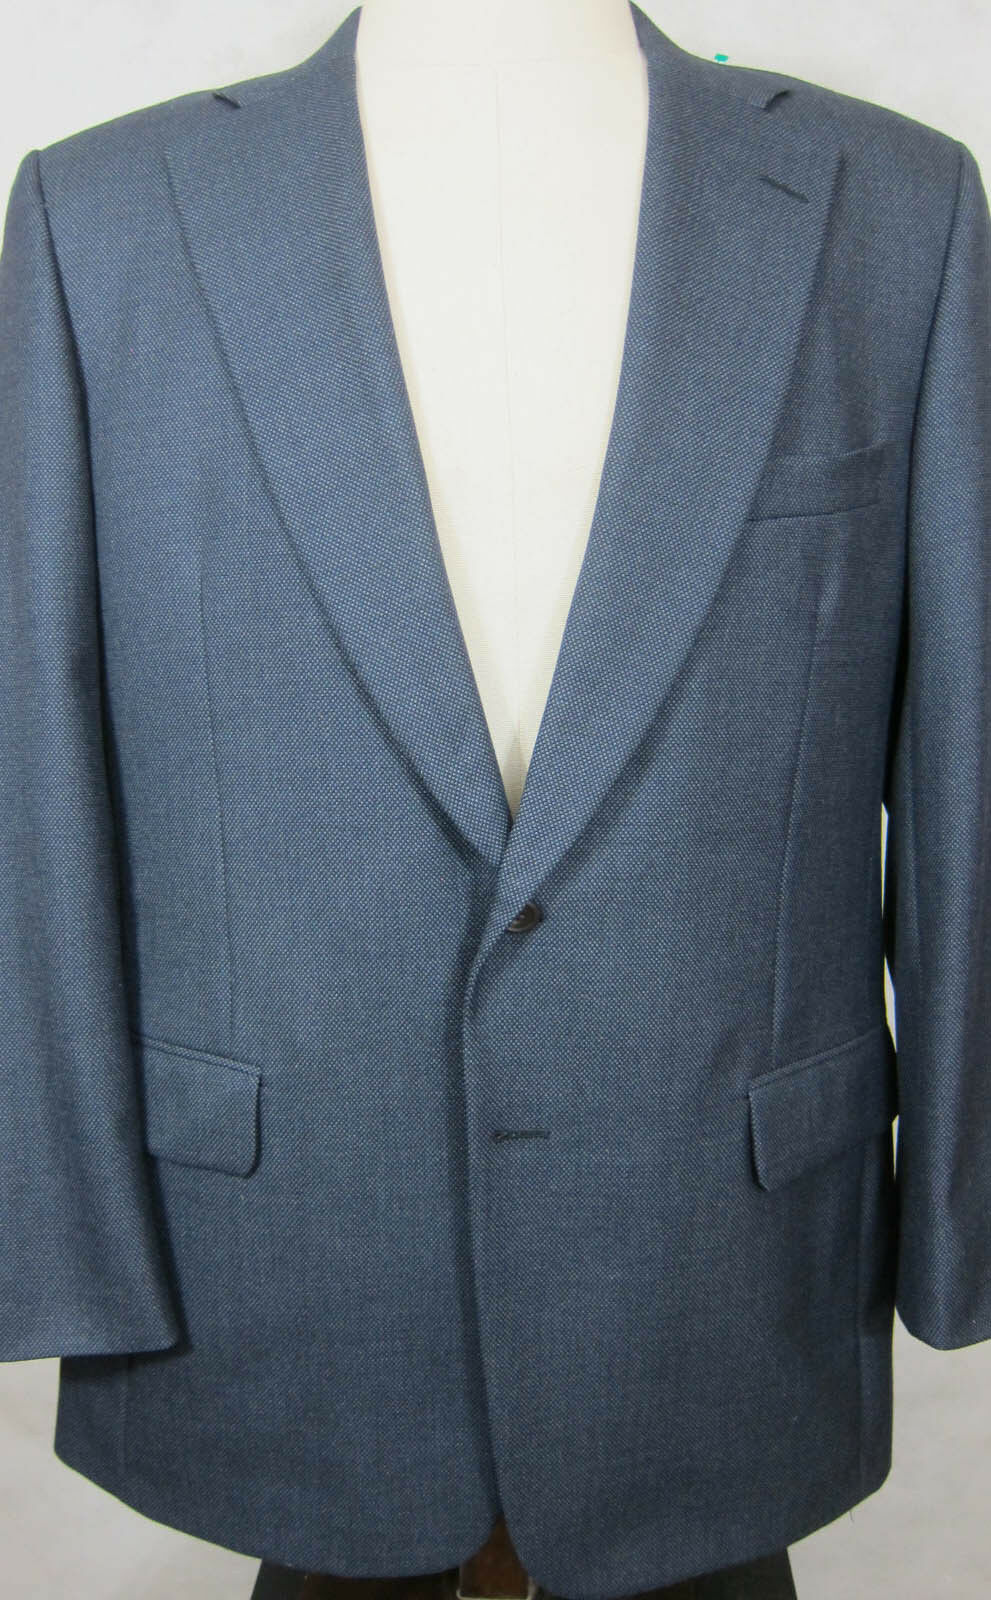 PRISTINE 2195 Paul Stuart II Blau Dobby English Wool Full Canvas Suit 43L 37W